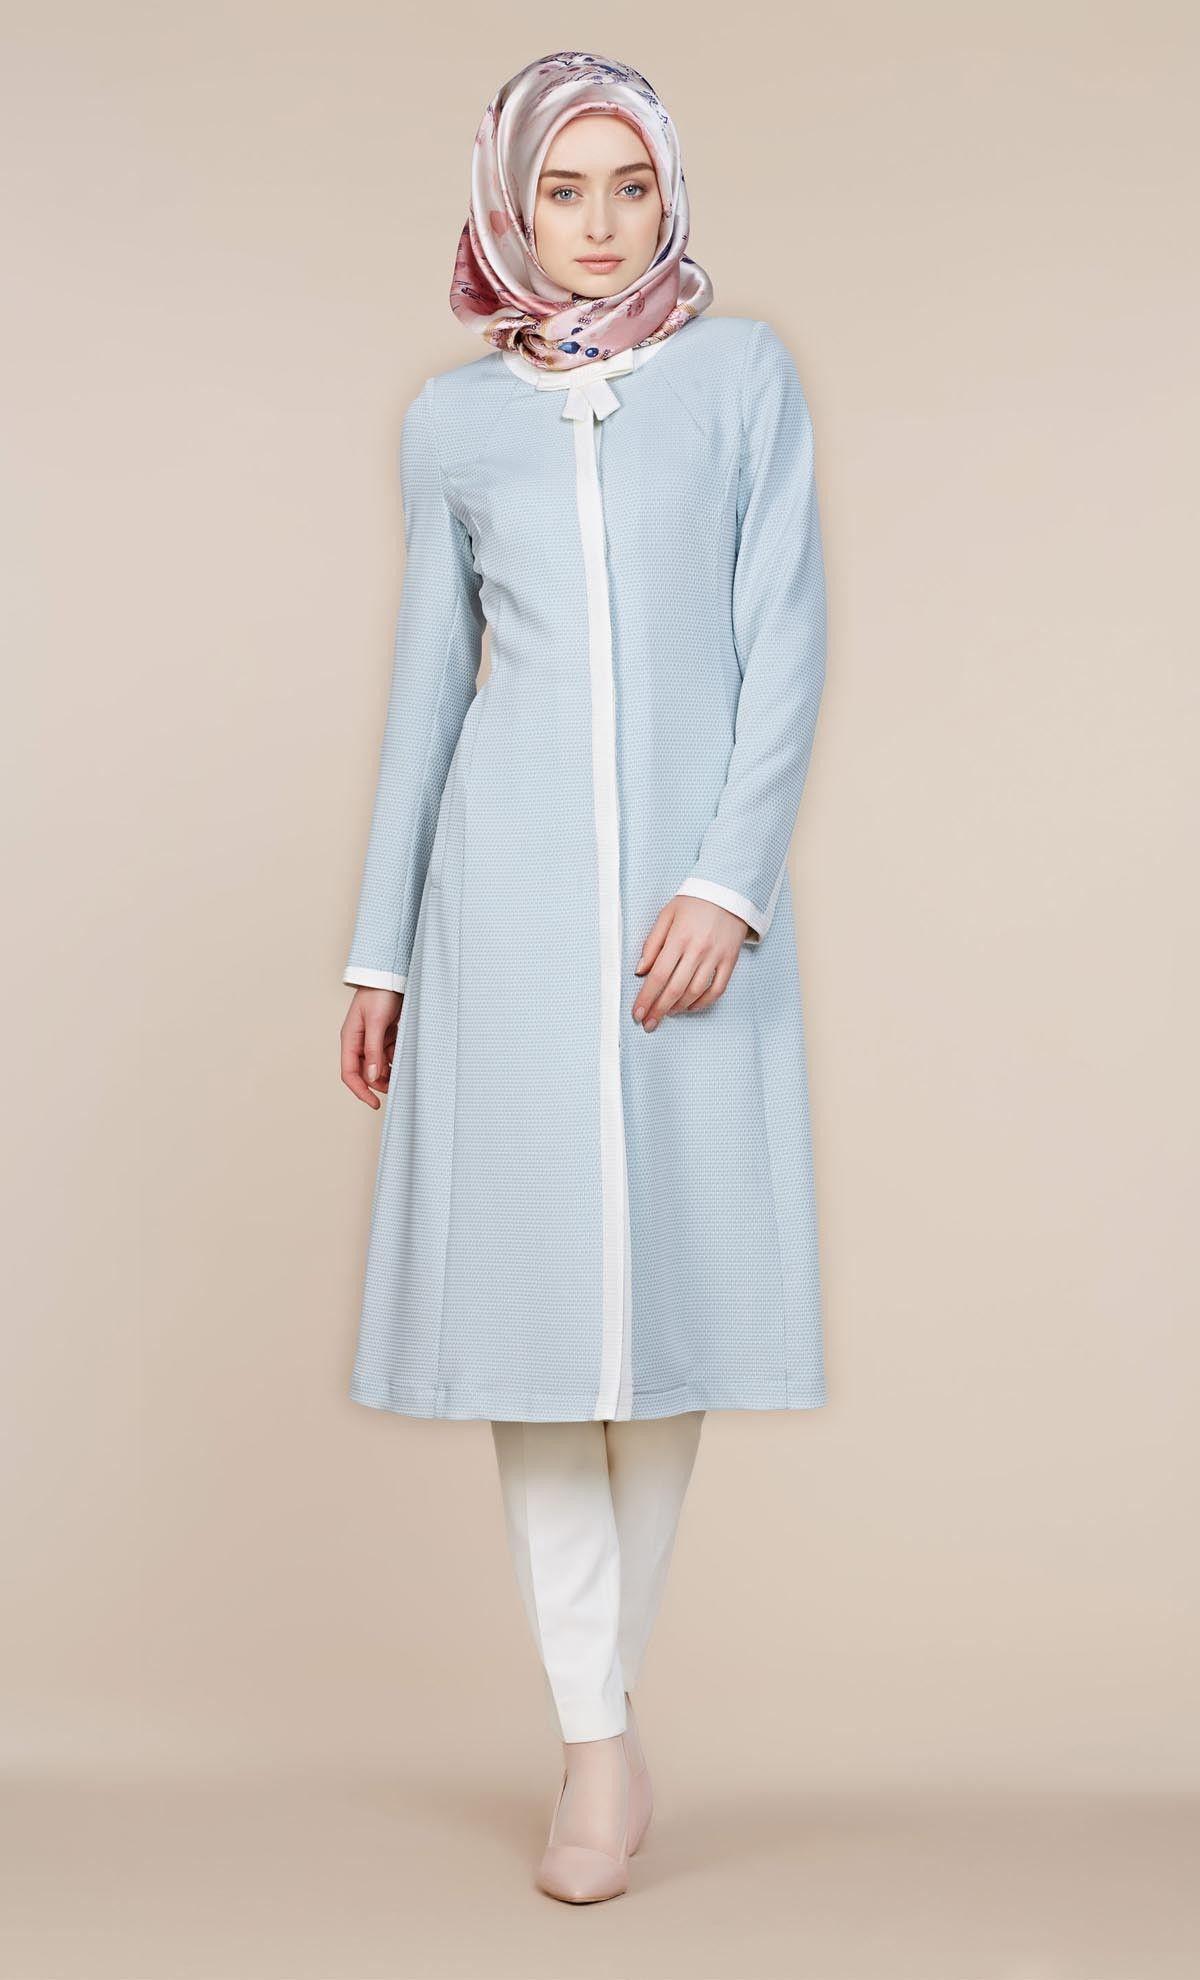 Tugba Store Tesettur Giyim Tesettur Elbise Pardesu Manto Online Alisveris Model Pakaian Hijab Model Pakaian Dan Ilustrasi Model Pakaian